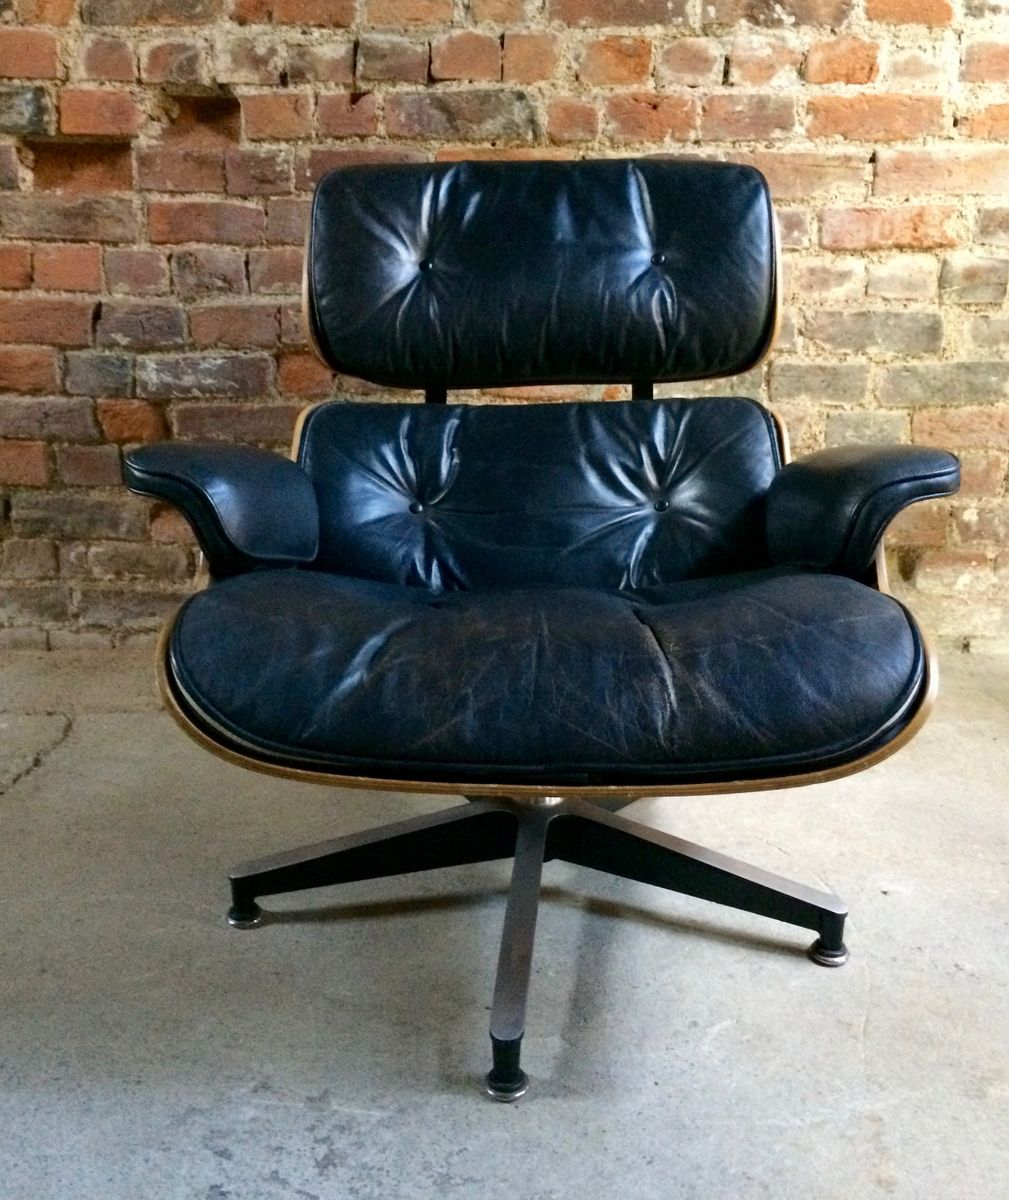 modell 670 sessel von charles ray eames f r herman miller 1970er bei pamono kaufen. Black Bedroom Furniture Sets. Home Design Ideas